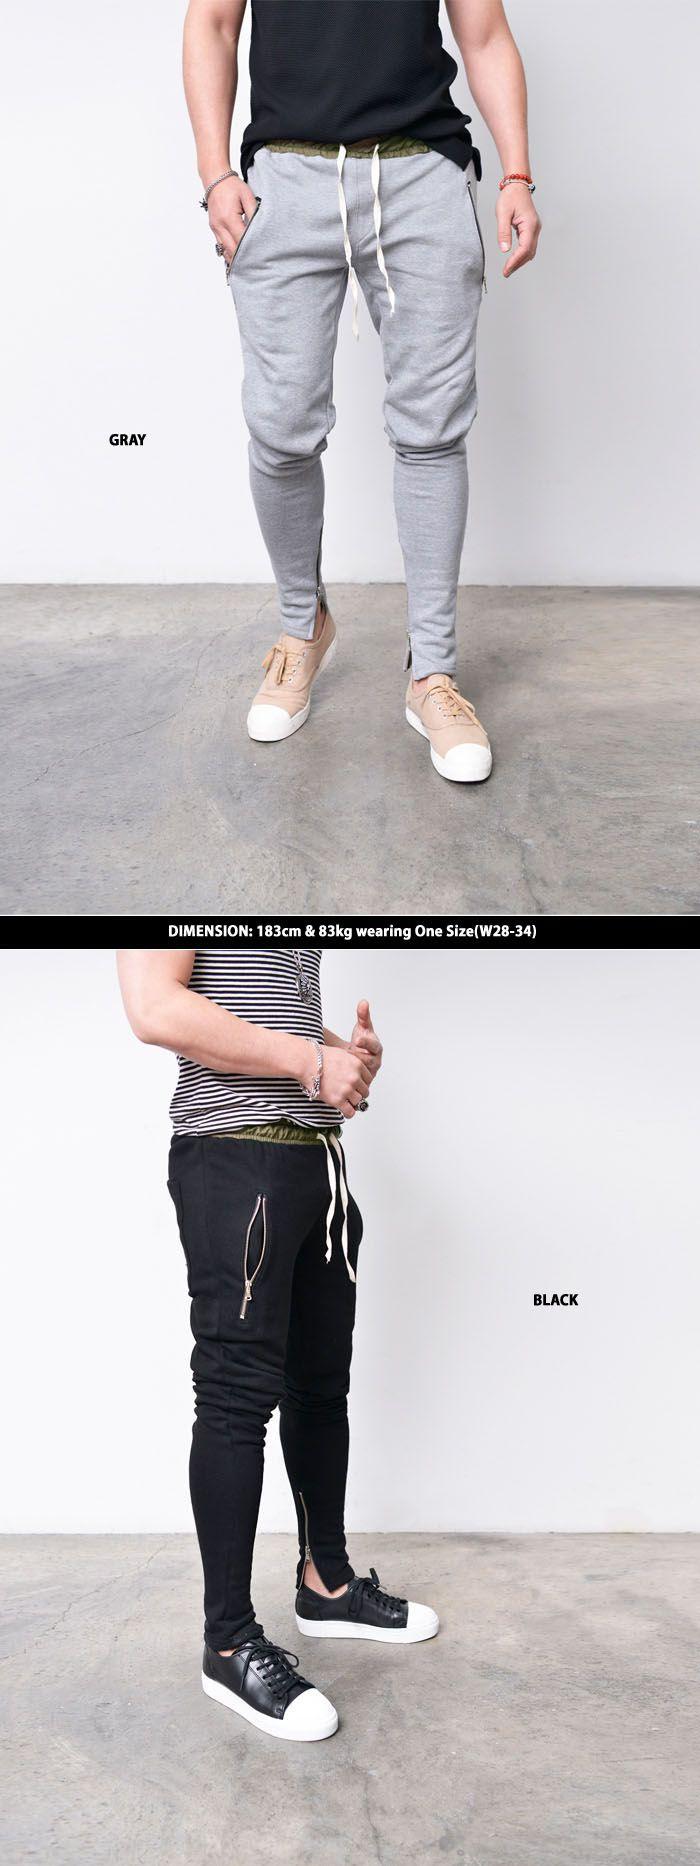 Mens Contrast Banding Zip Legs Semi Baggy-Sweatpants 271 by Guylook.com